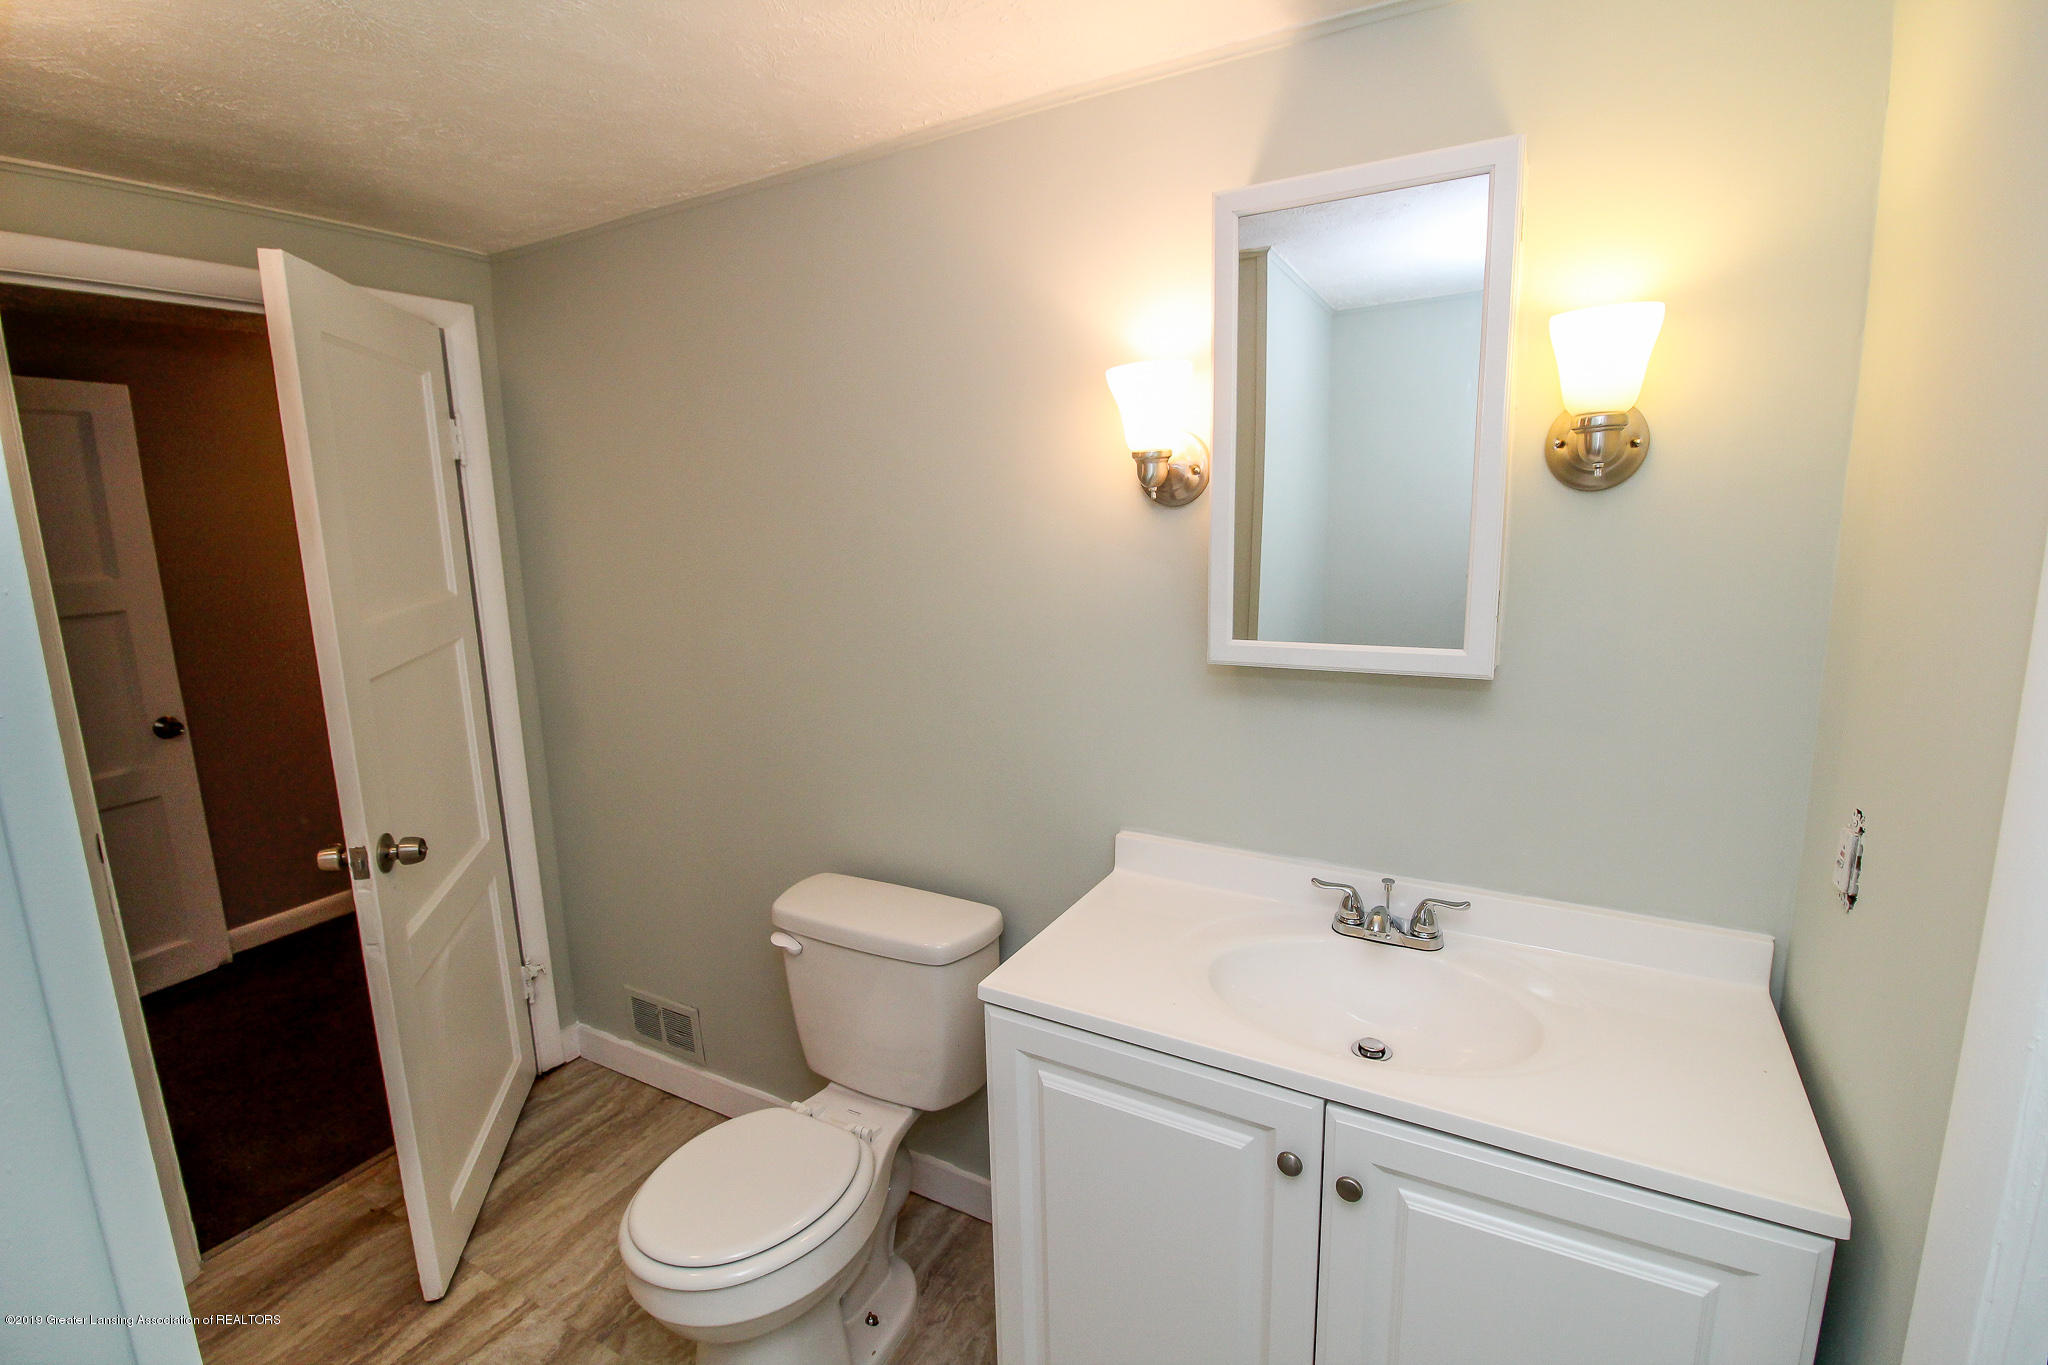 124 Northlawn Ave - 35 Second Floor Bathroom 4 - 28